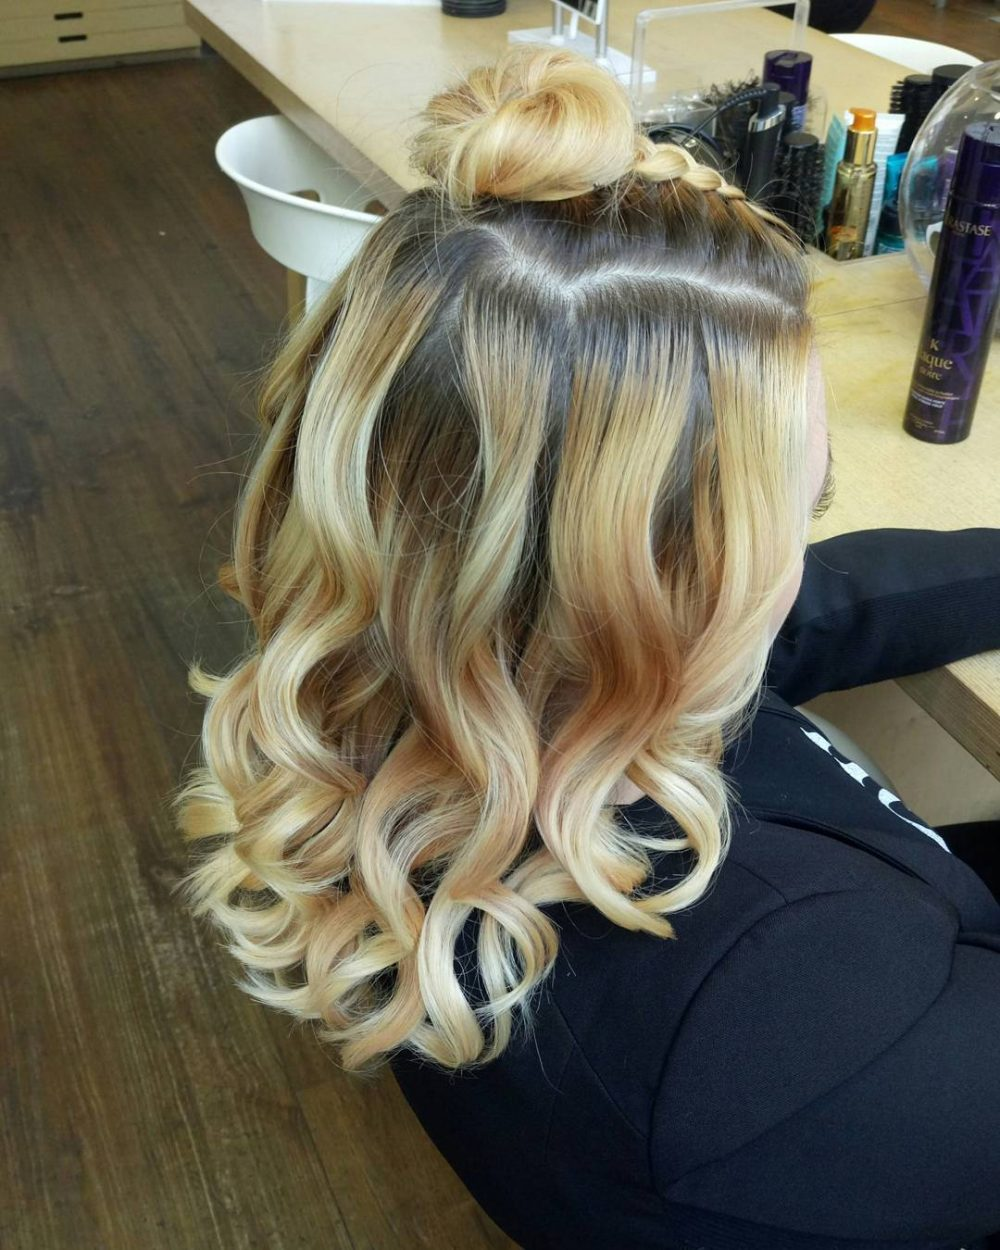 Half Up Dutch Braid hairstyle